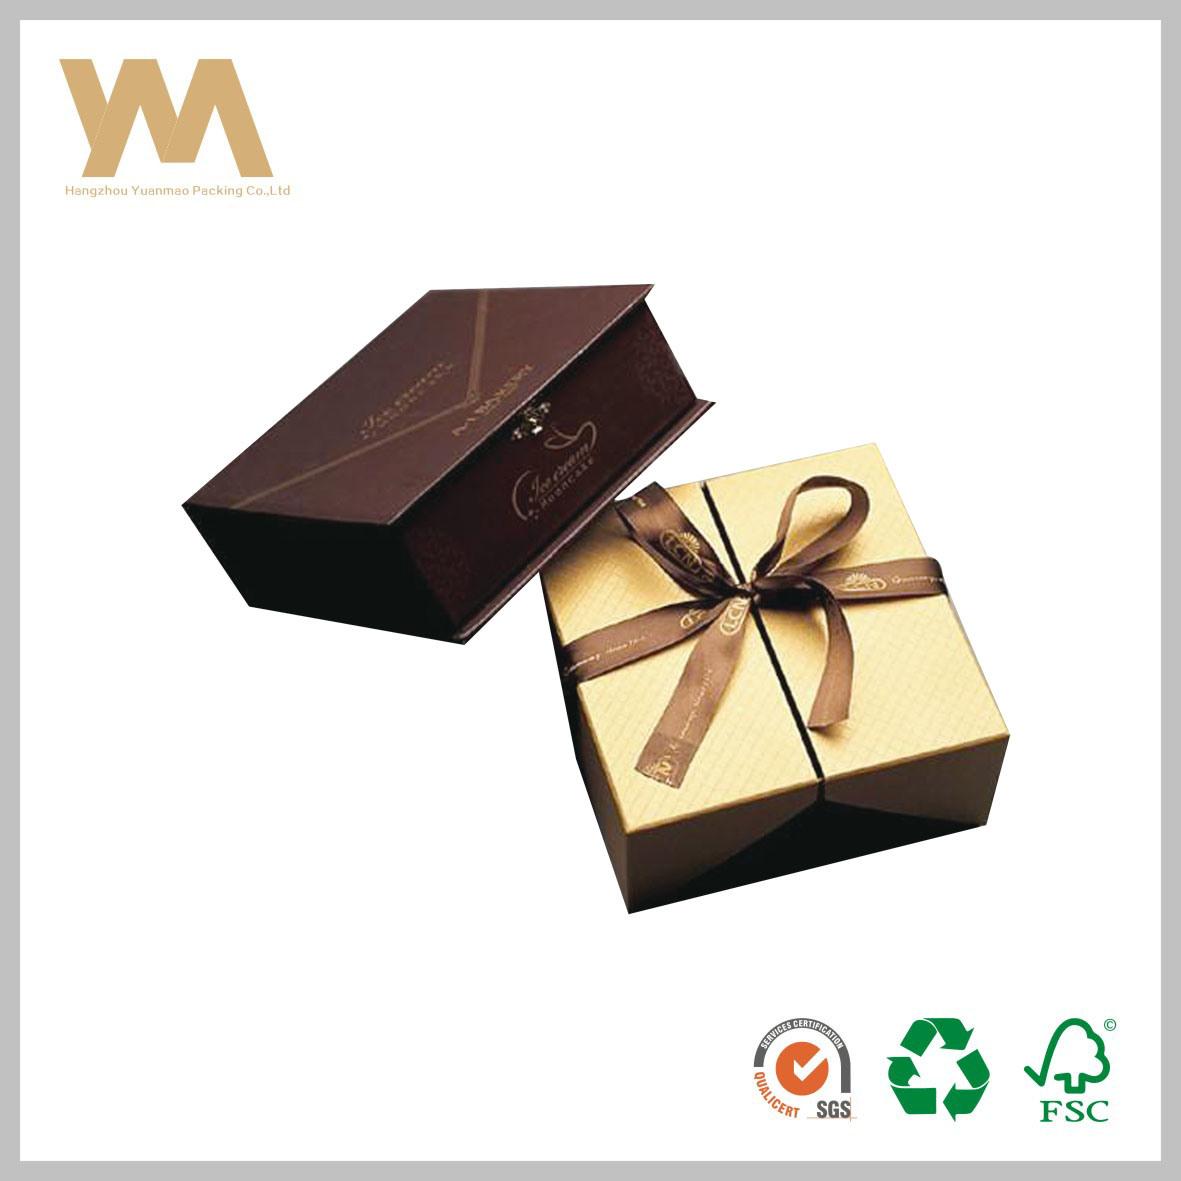 Hot Item Cardboard Paper Folding Box Fold Gift Box Small Foldable Jewelry Boxes